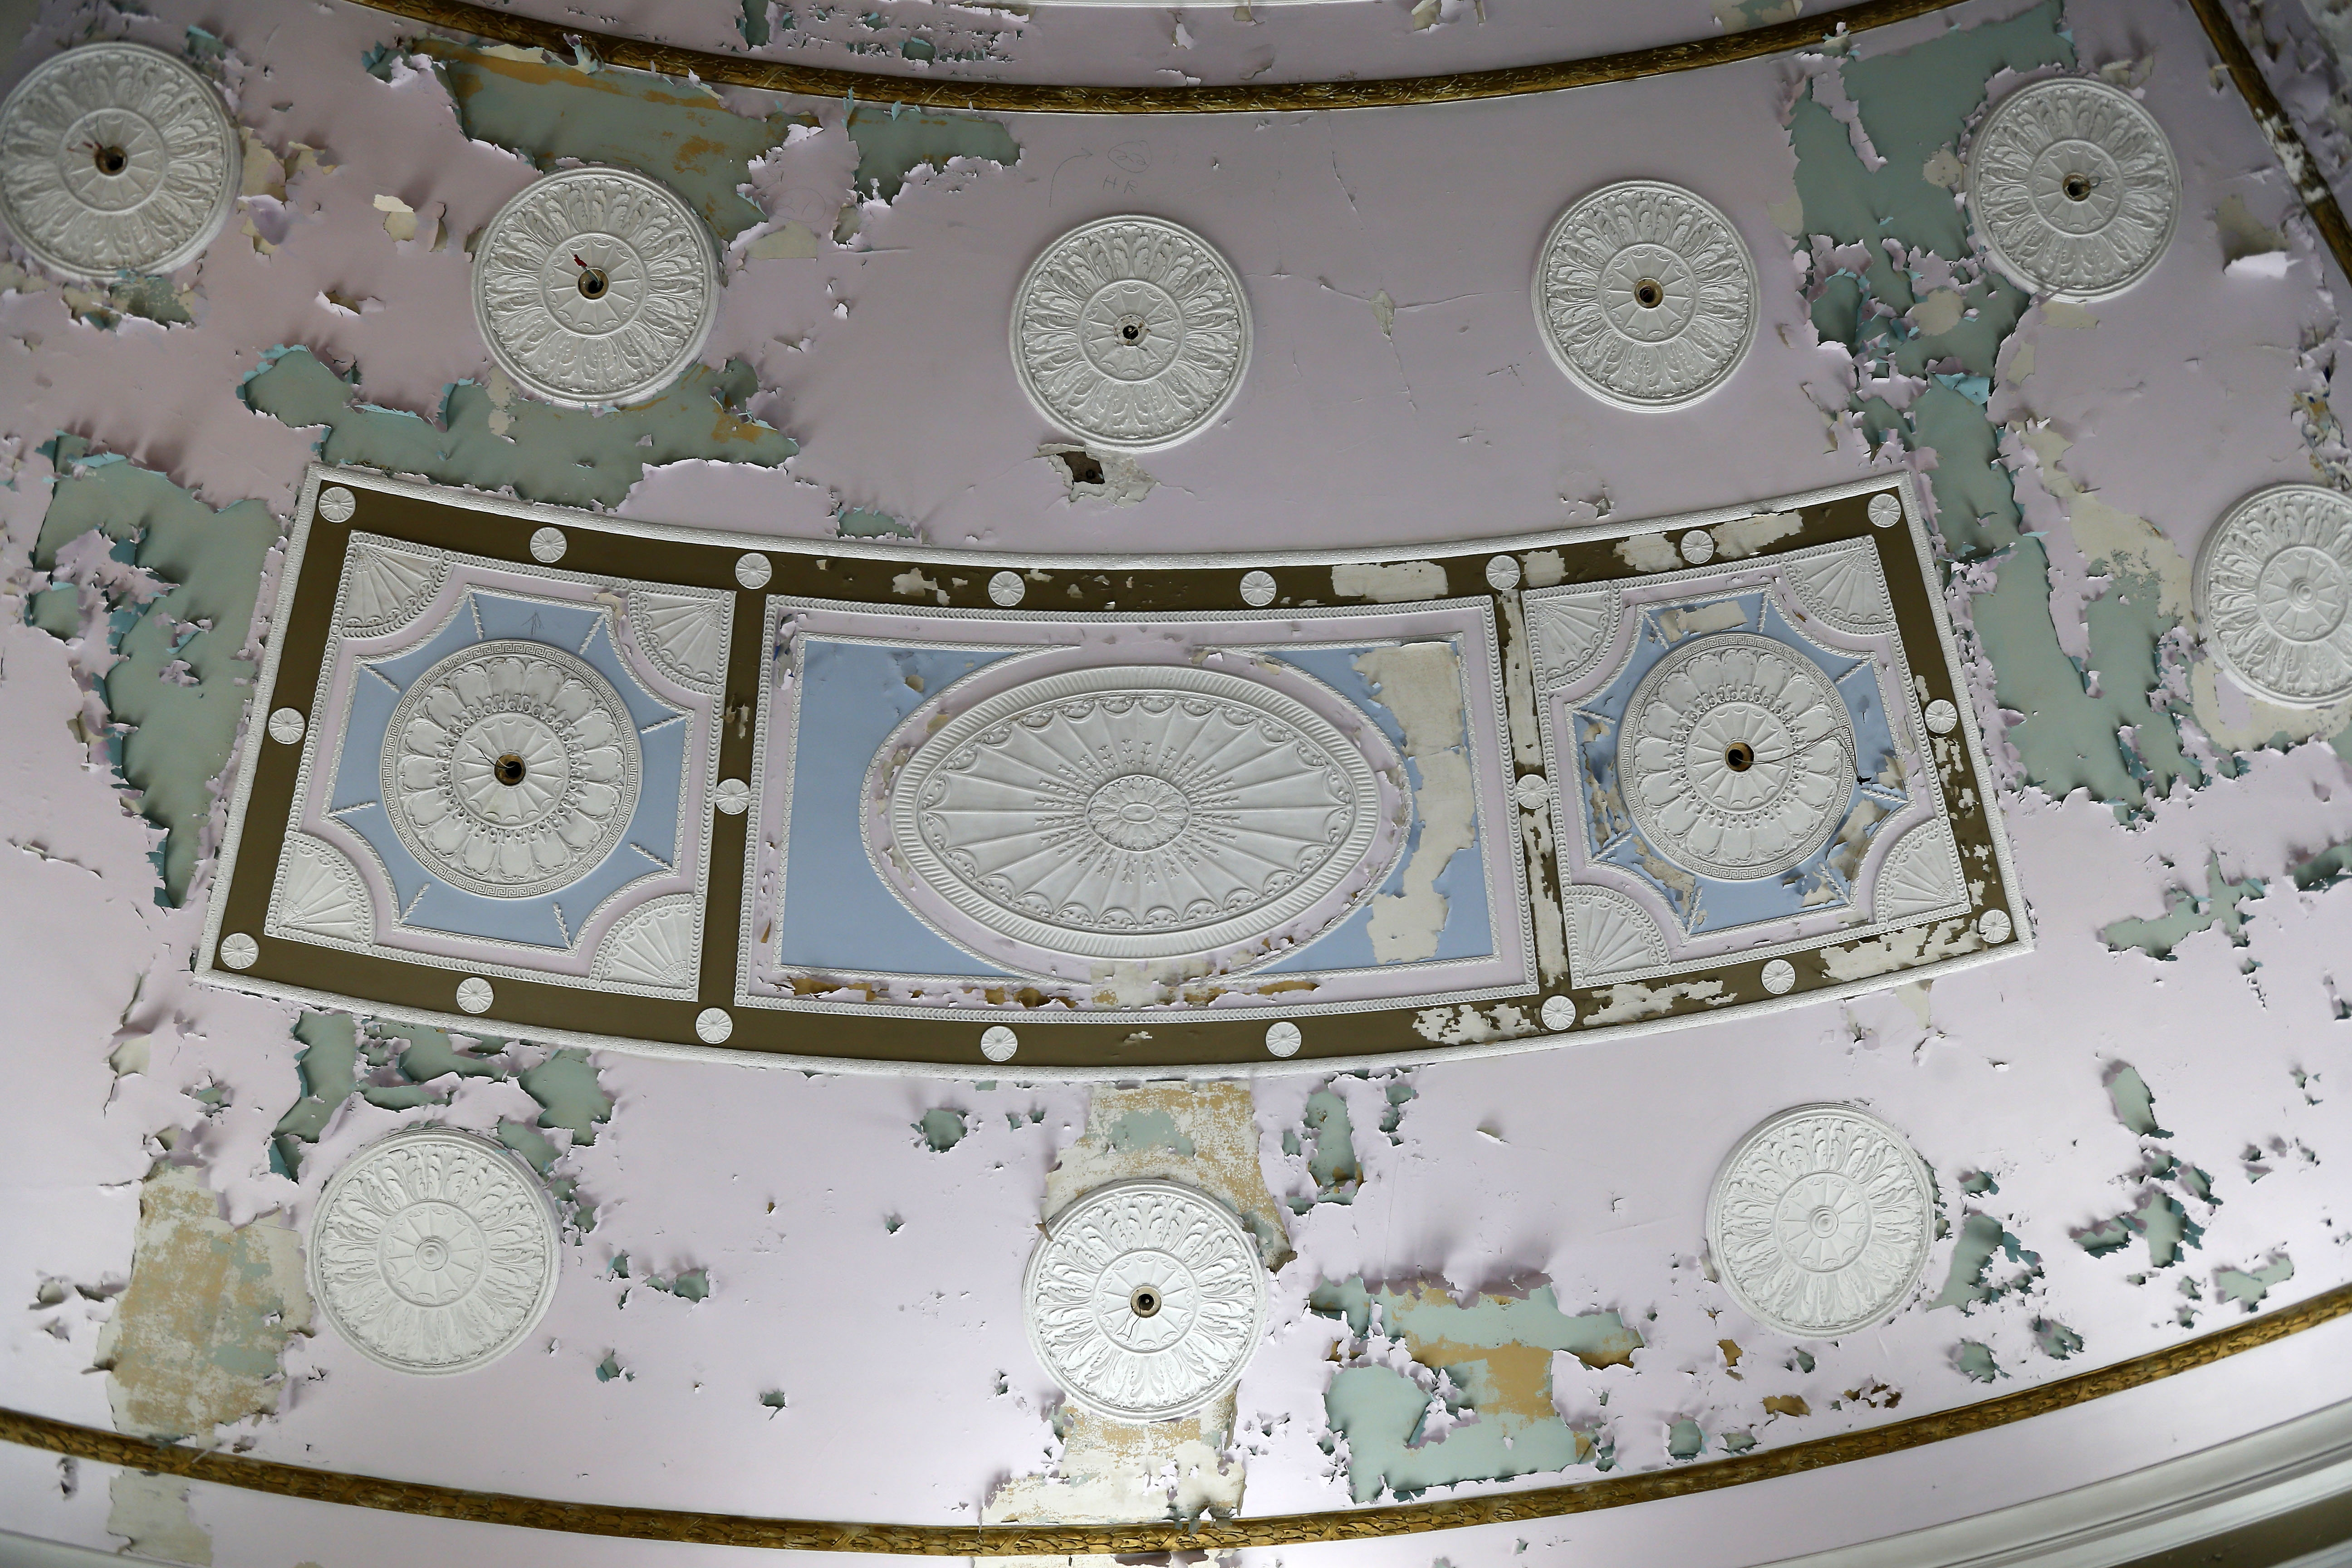 The lobby ceiling at the Hotel Niagara in Niagara Falls Wednesday, August 31, 2016.       (Mark Mulville/Buffalo News)